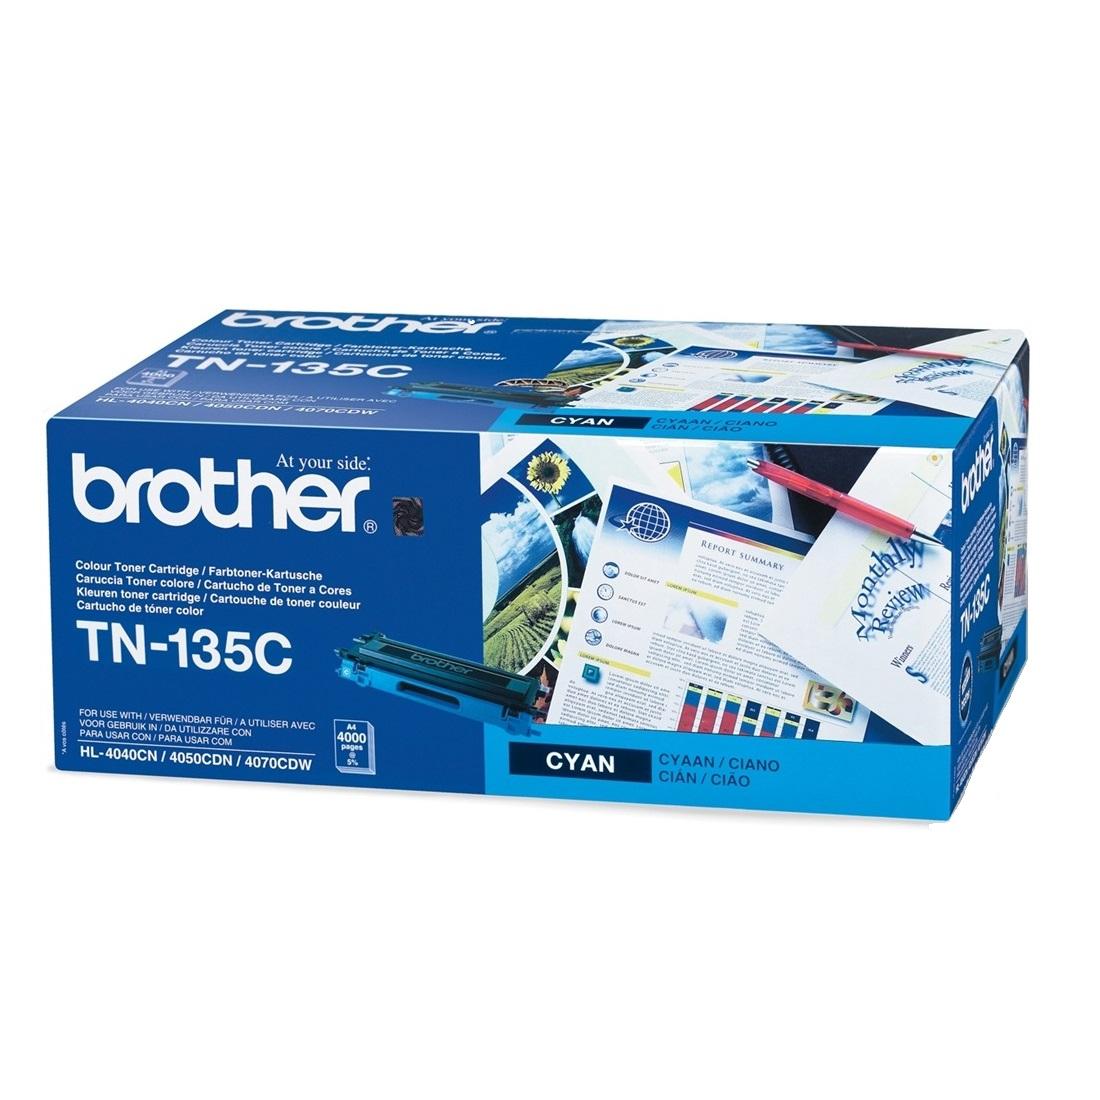 Тонер-картридж Brother TN130BK чёрный  для HL-4040CN/HL-4050CDN/DCP-9040CN/MFC-9440CN (2500 стр)